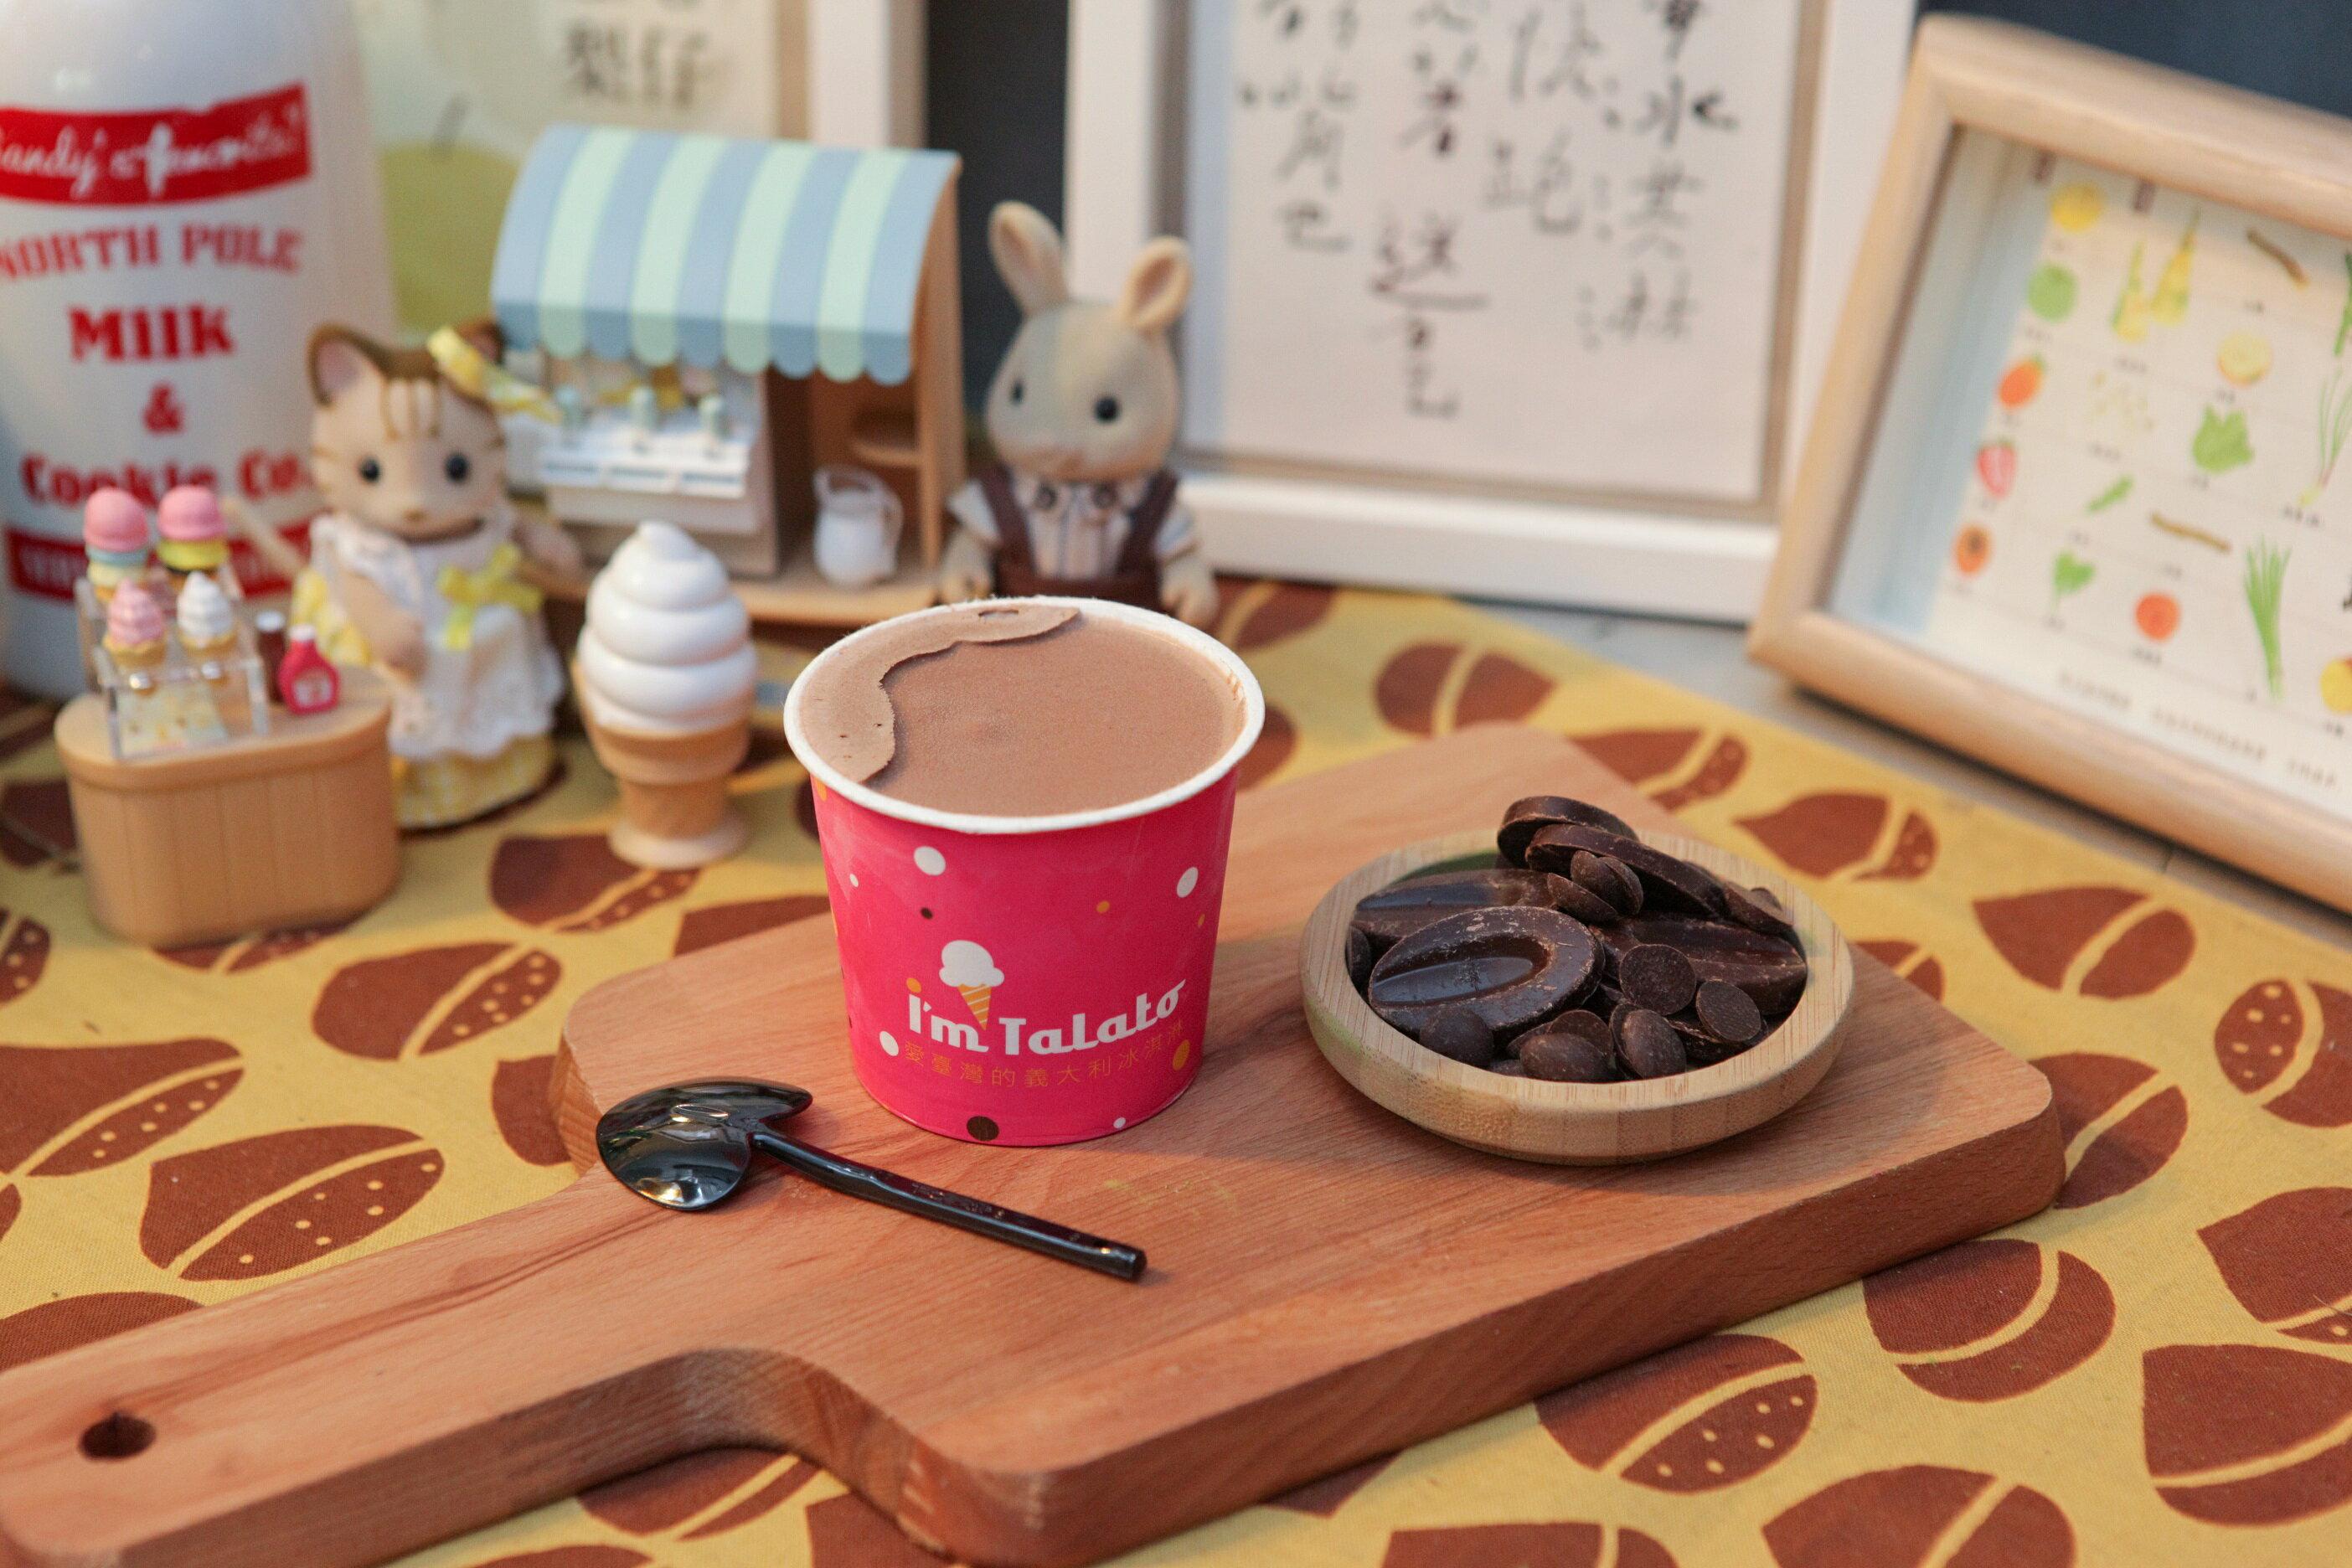 [i'm talato 義式冰淇淋] 巧克力冰淇淋120 ml/杯